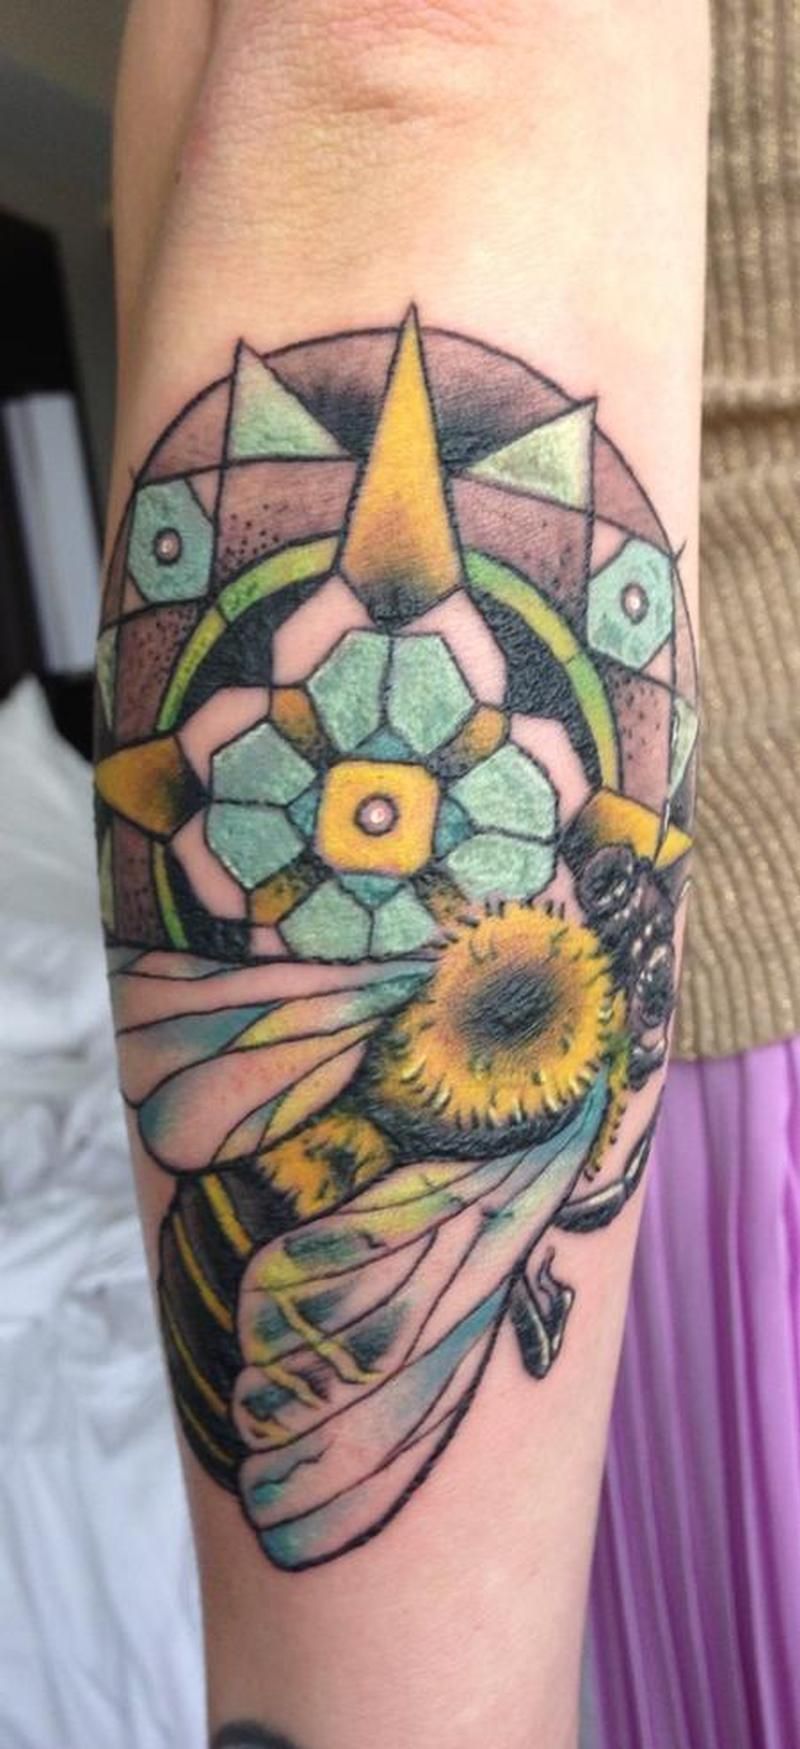 Big colorful bee tattoo on arm